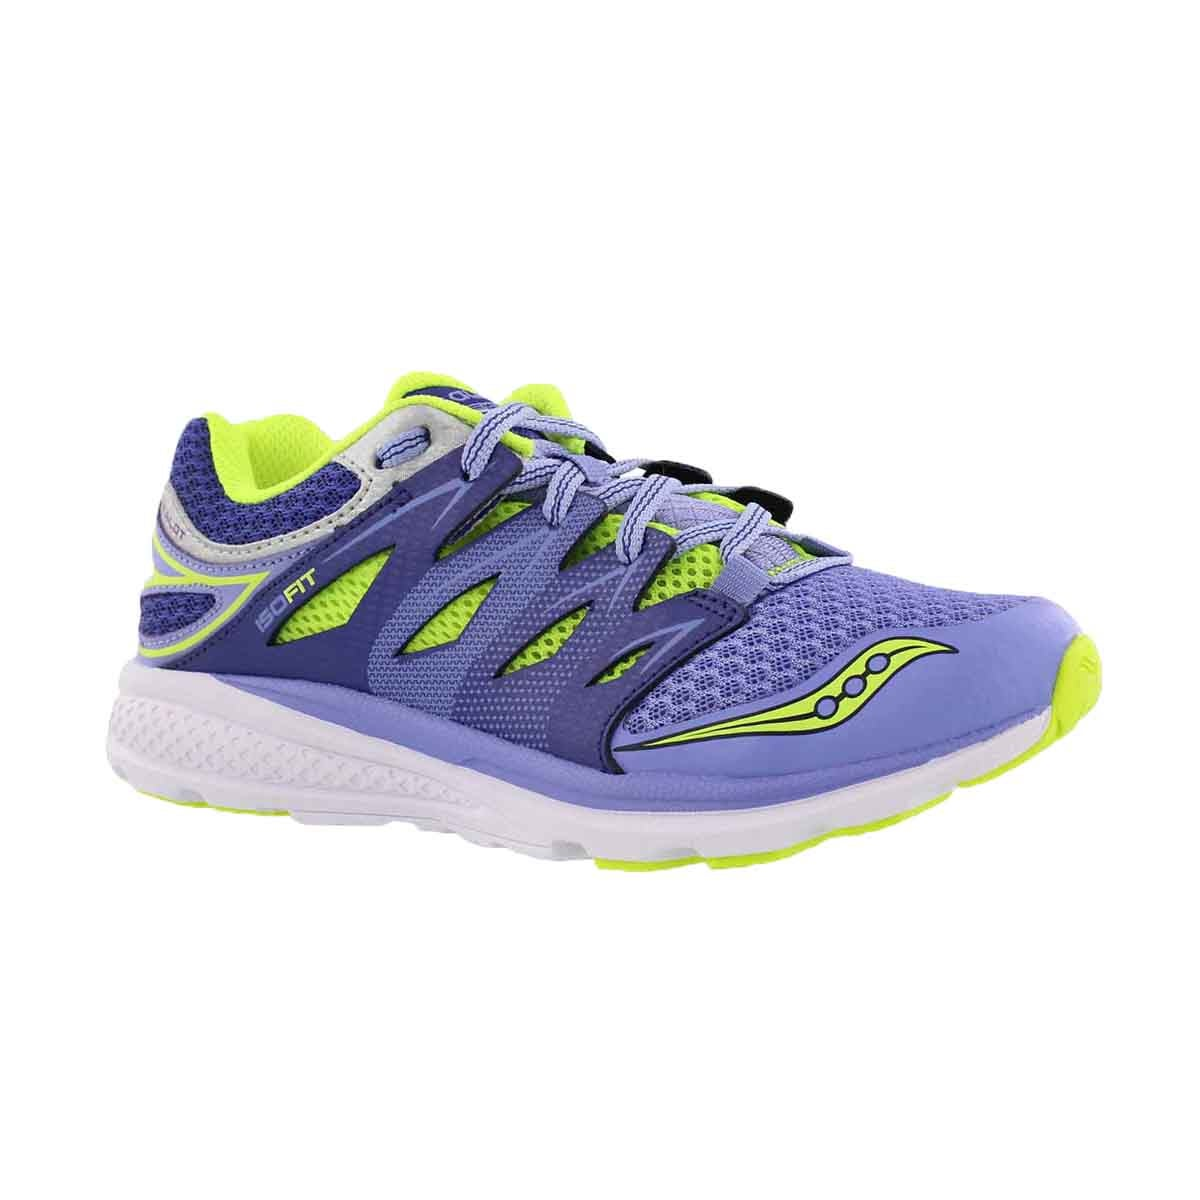 Girls' ZEALOT 2 purple/blue running shoe